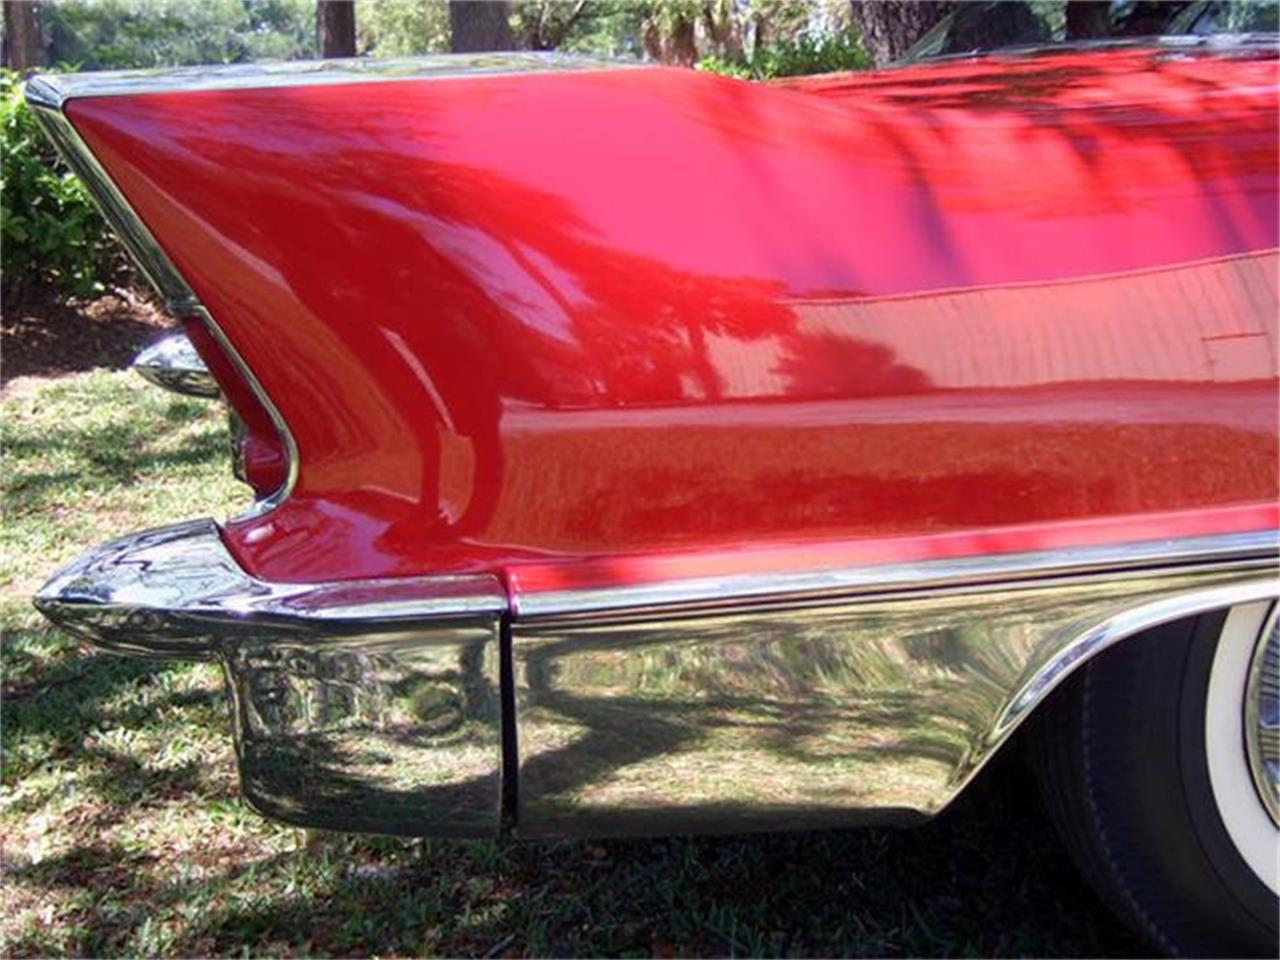 Large Picture of '58 Cadillac Eldorado Brougham located in Sarasota Florida - $169,900.00 - B3EW